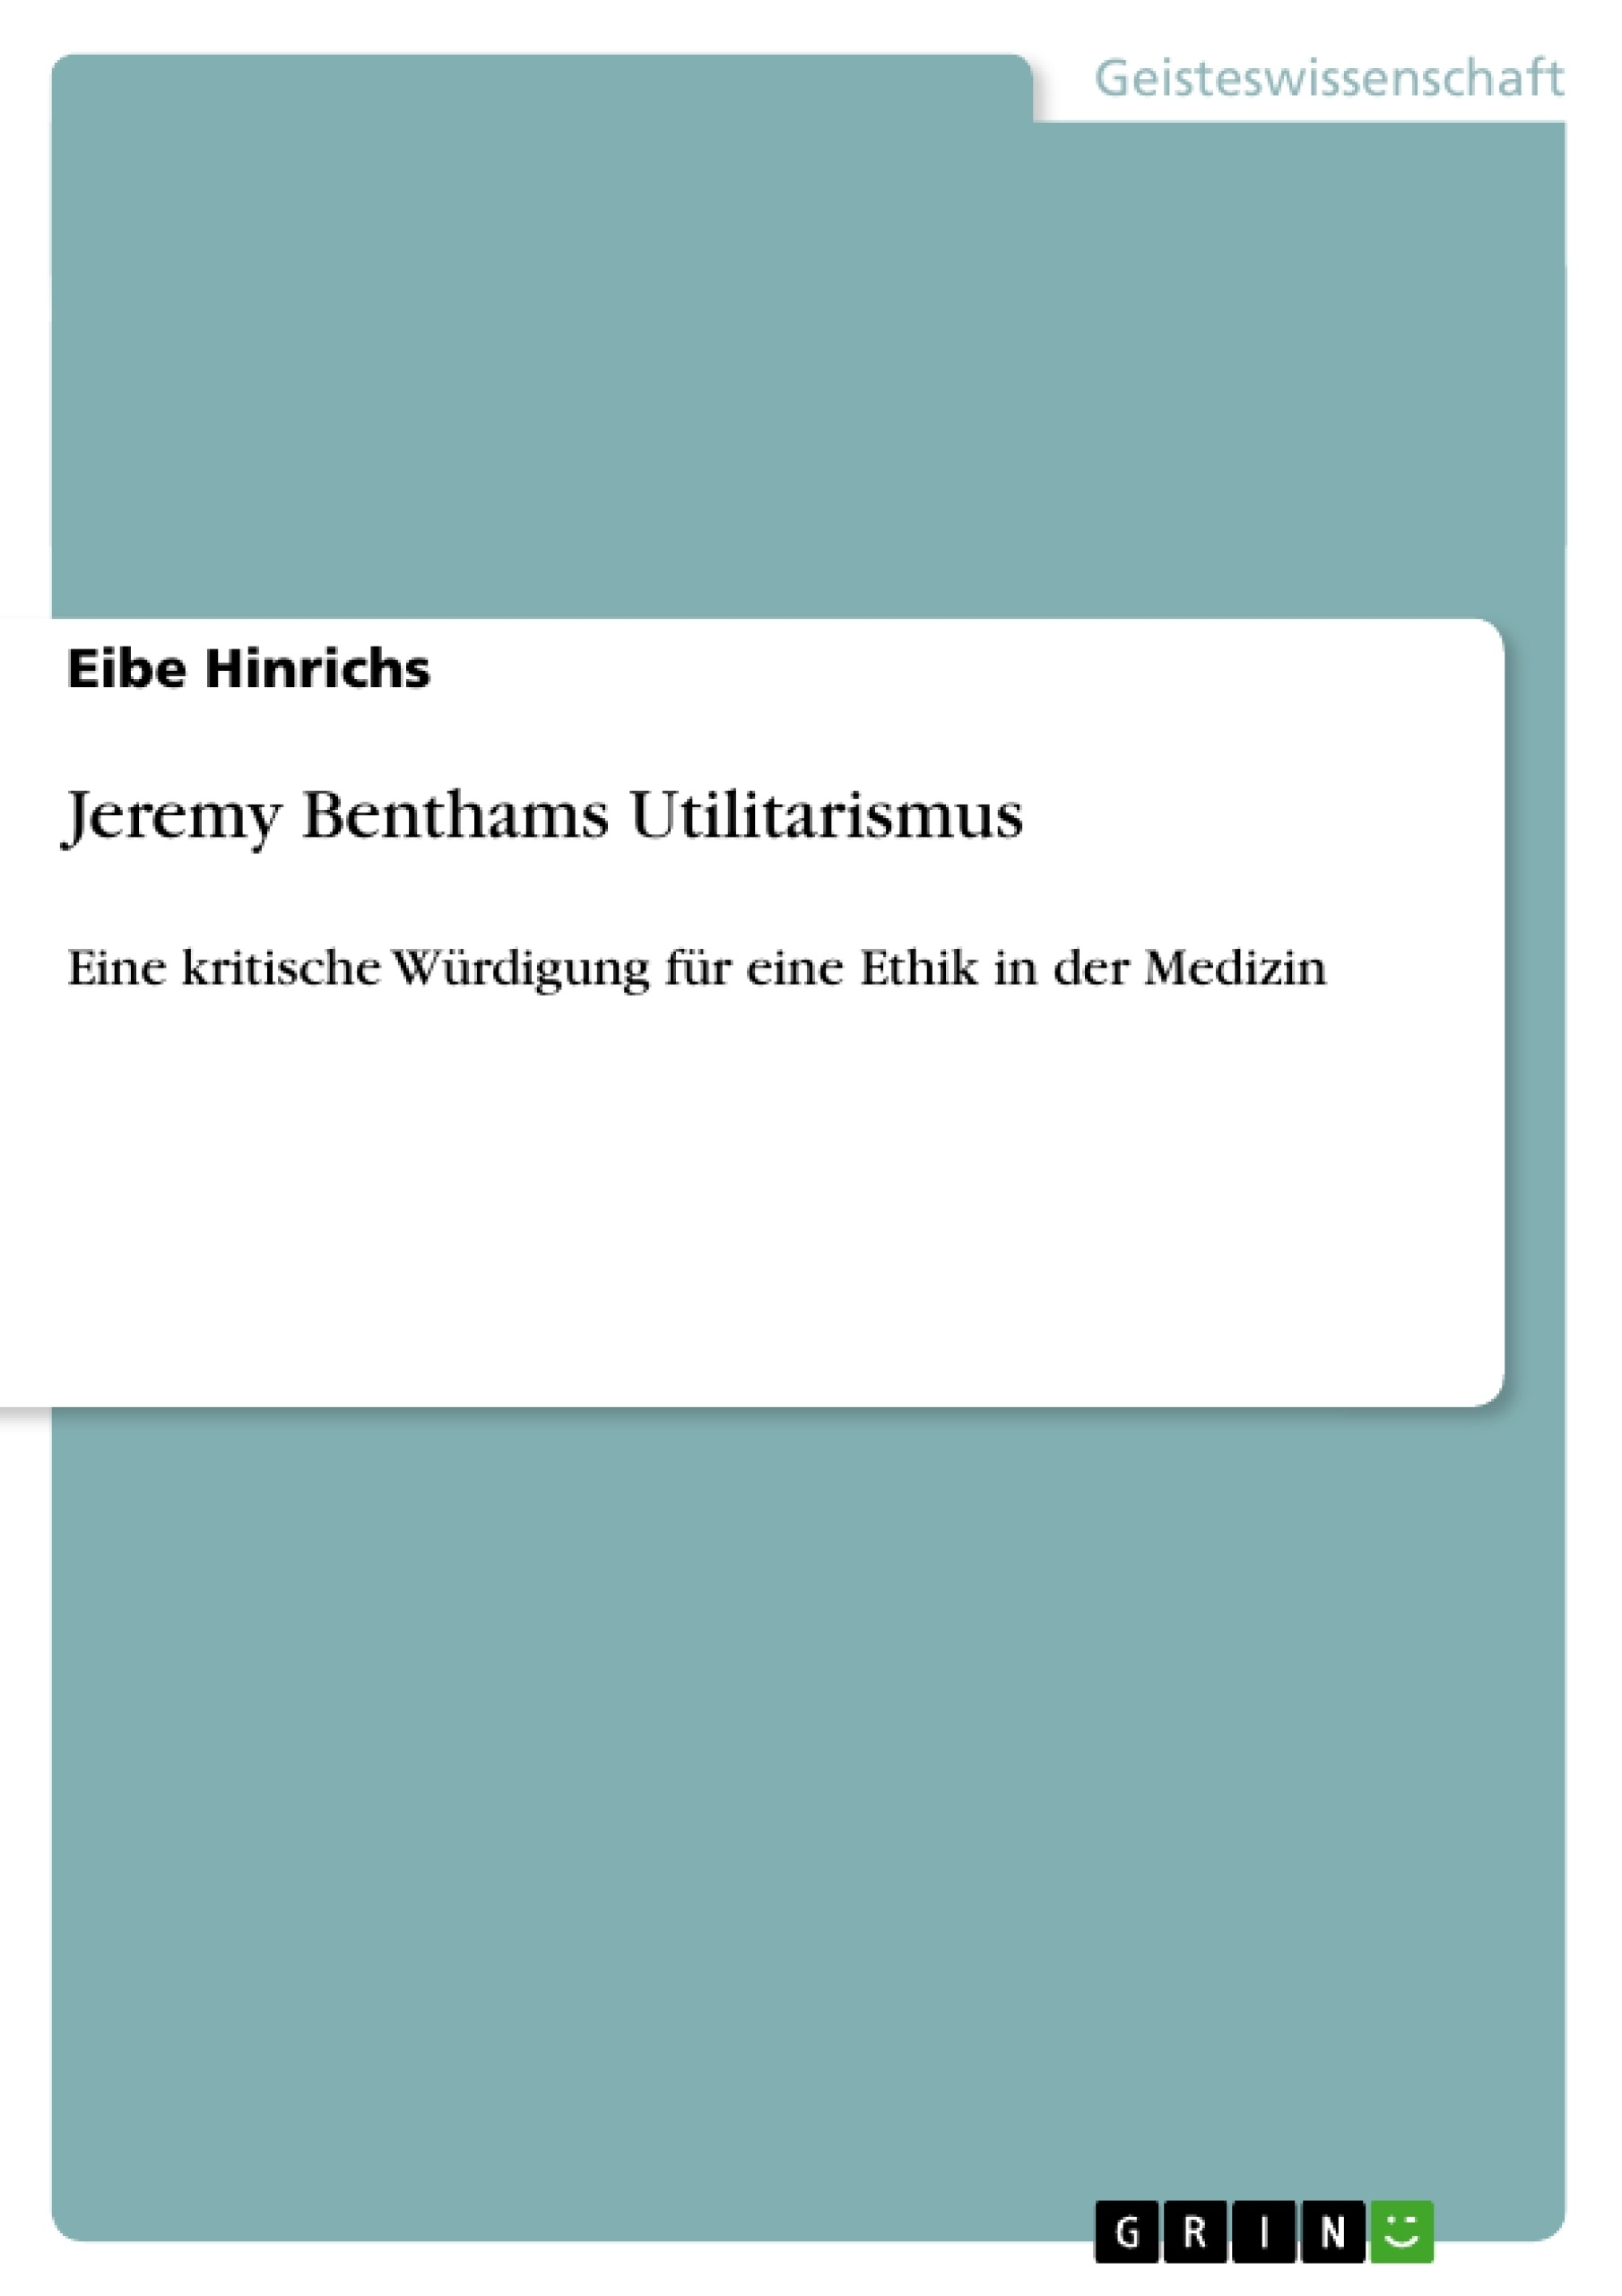 Titel: Jeremy Benthams Utilitarismus